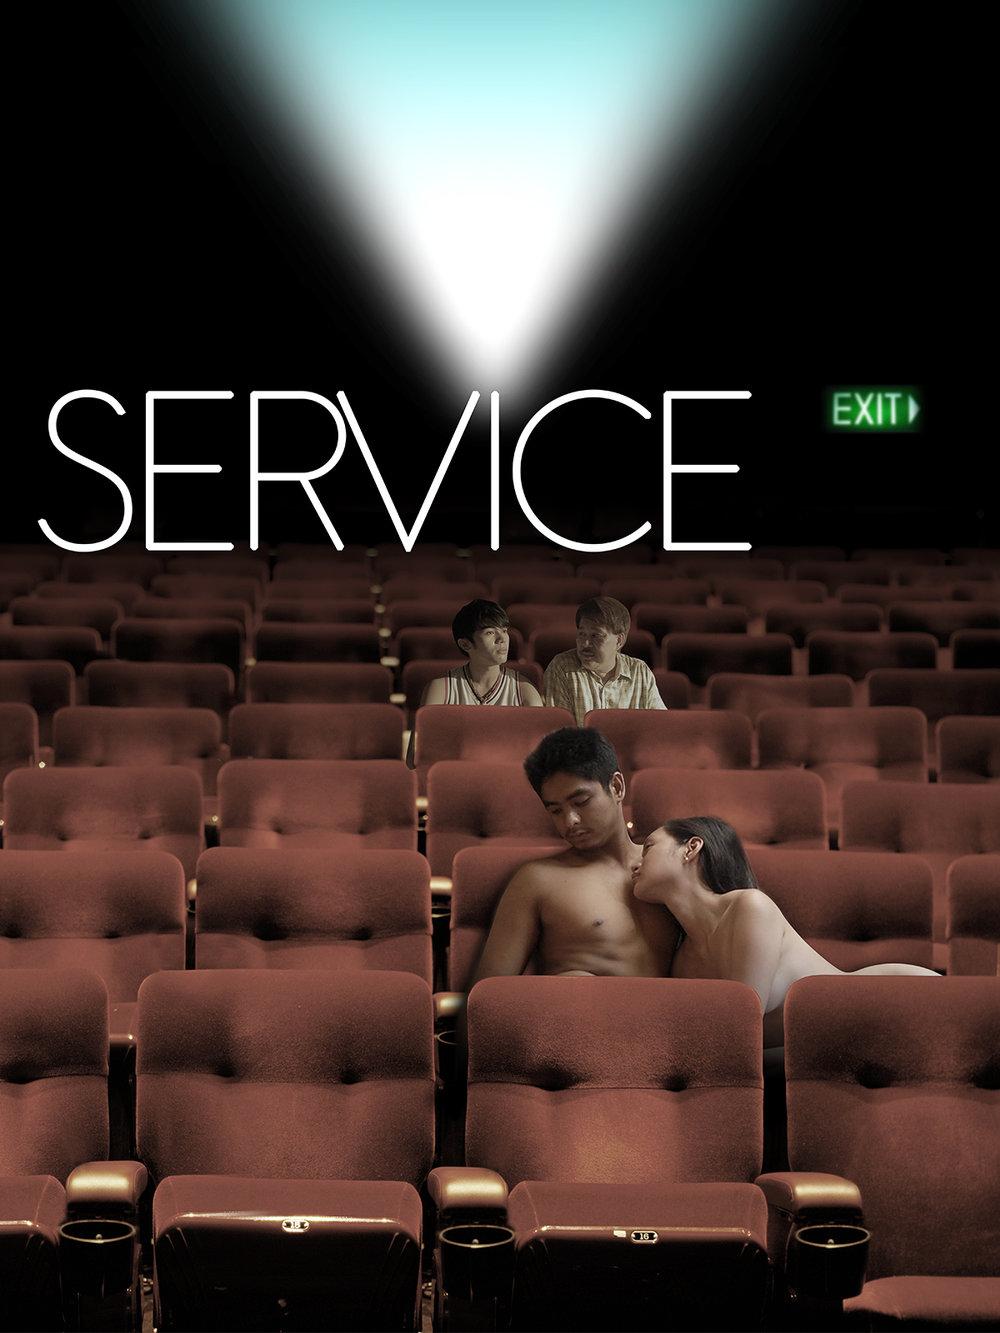 Here-Service-Full-Image-en-US.jpg